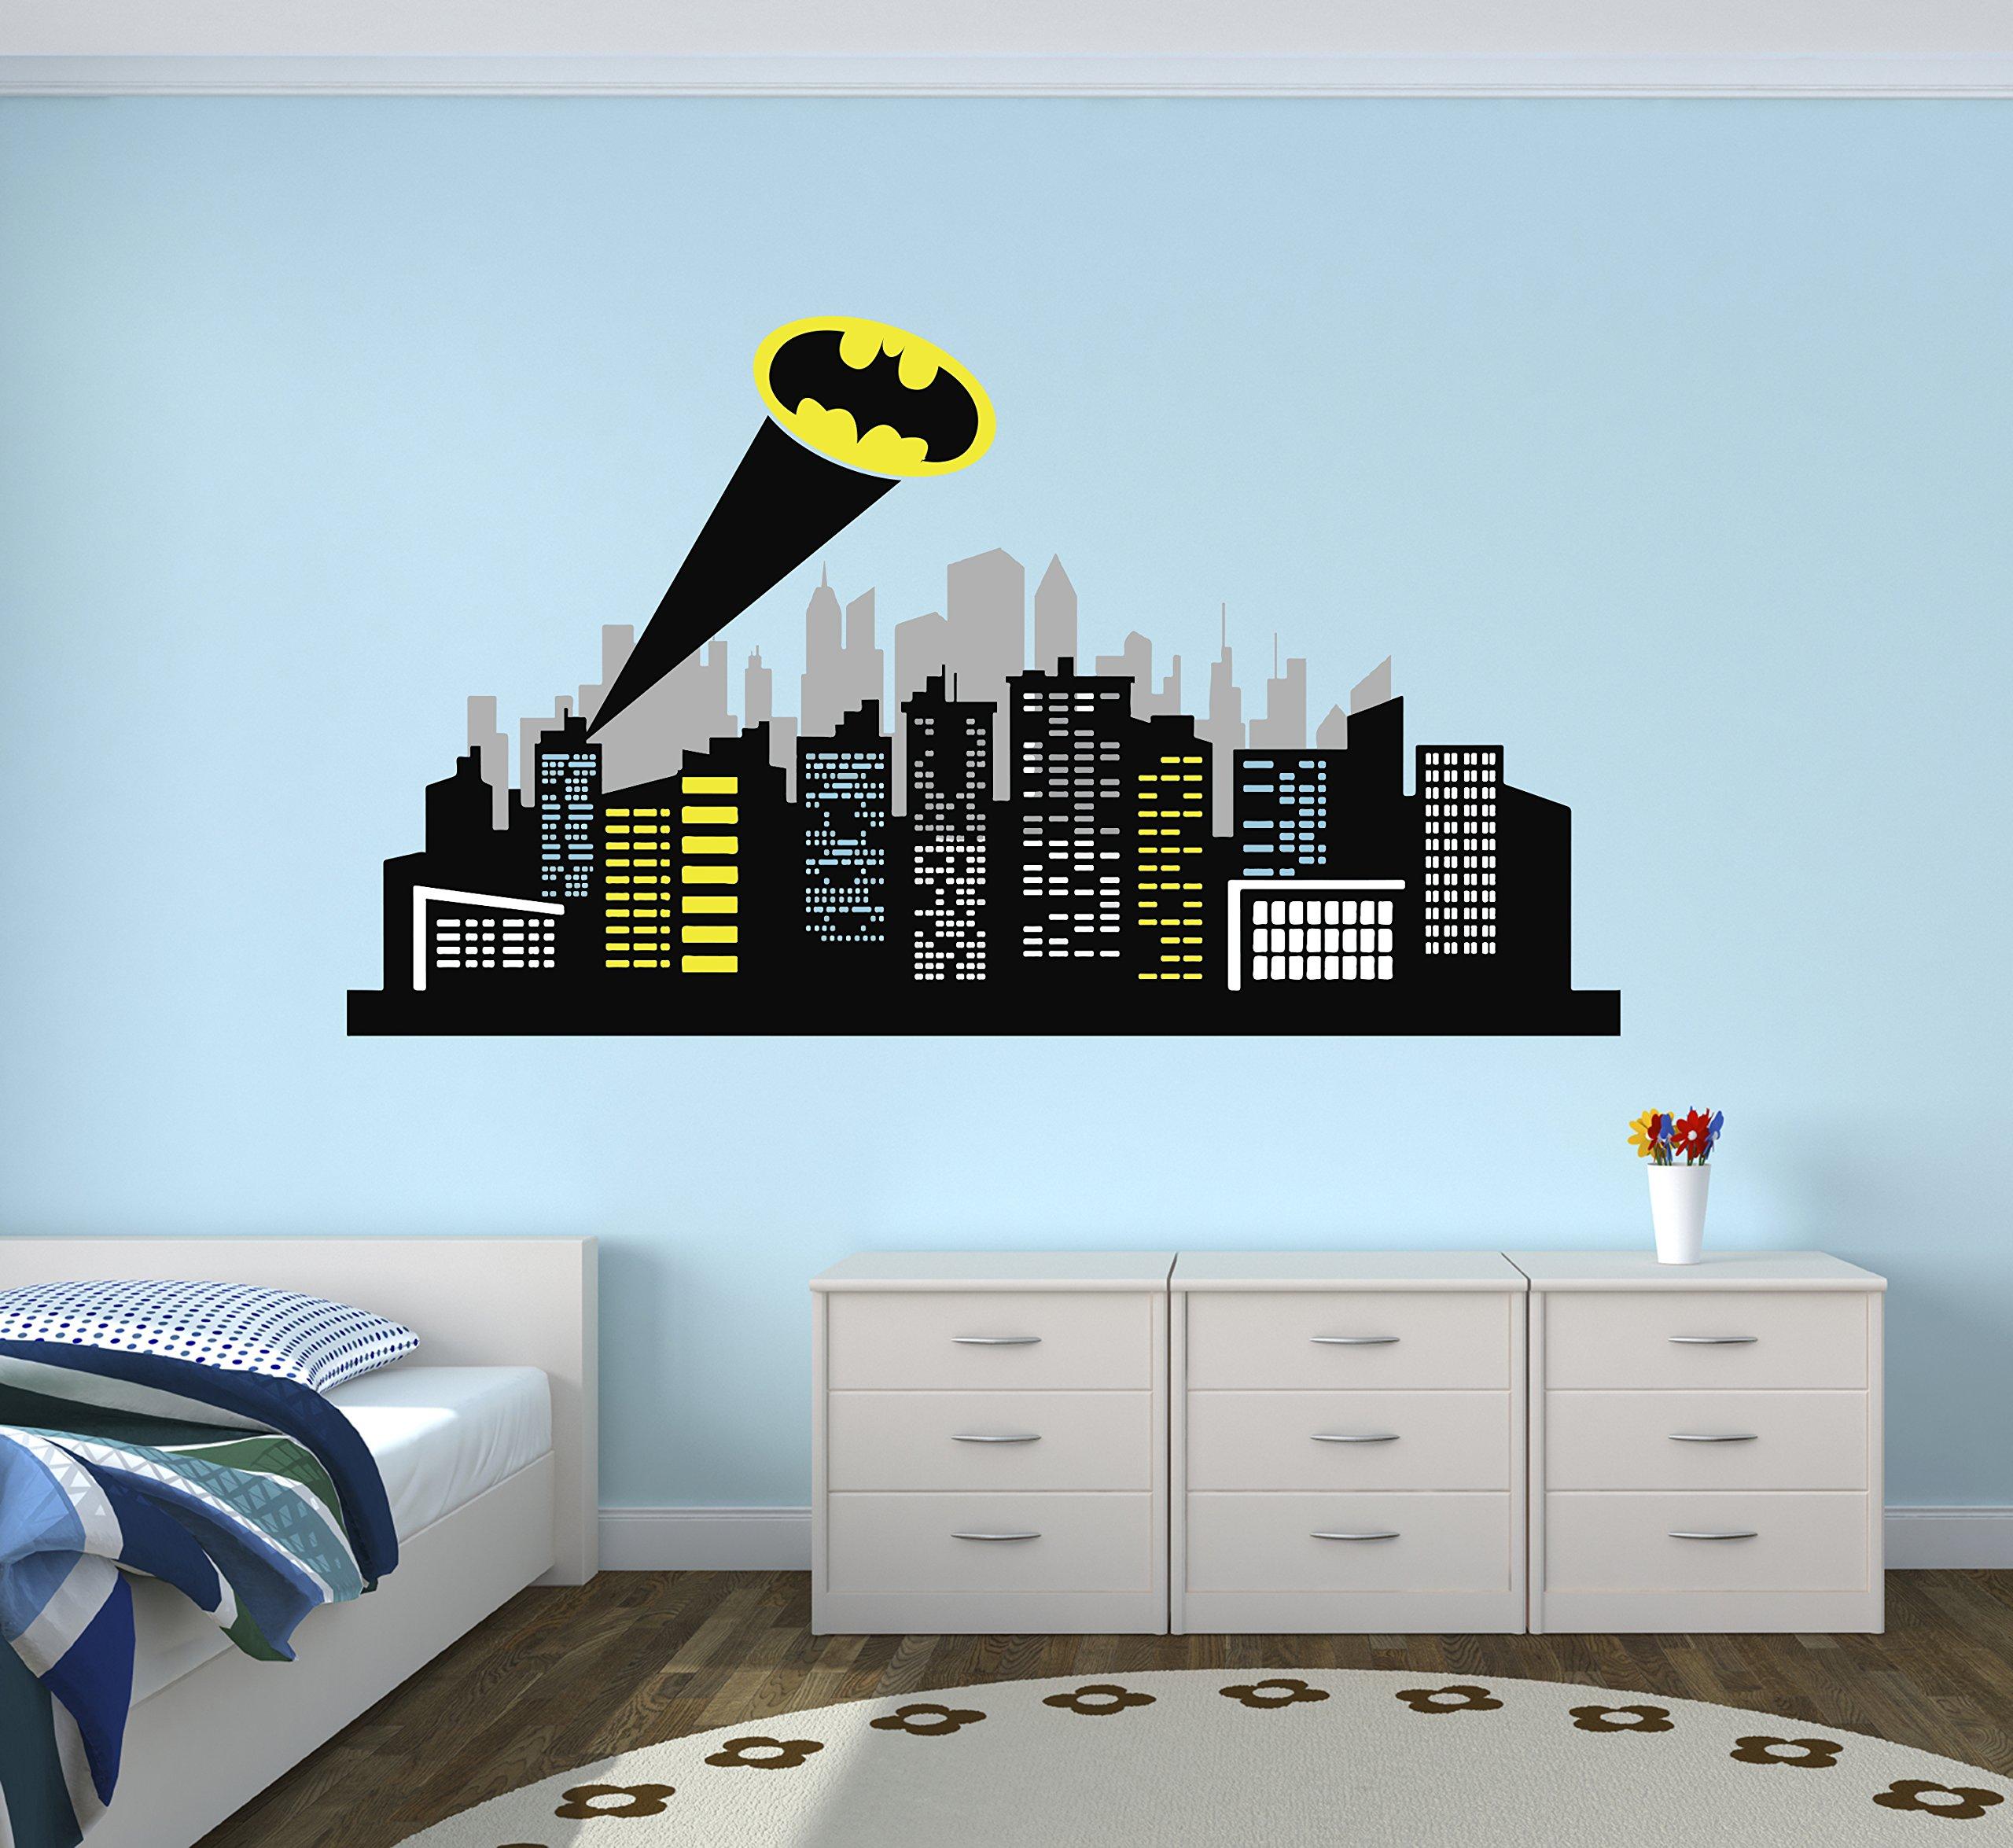 Gotham City Wall Decal Baby Boy Kids Decor Nursery Gift Art Vinyl Sticker by Decalzone Inc